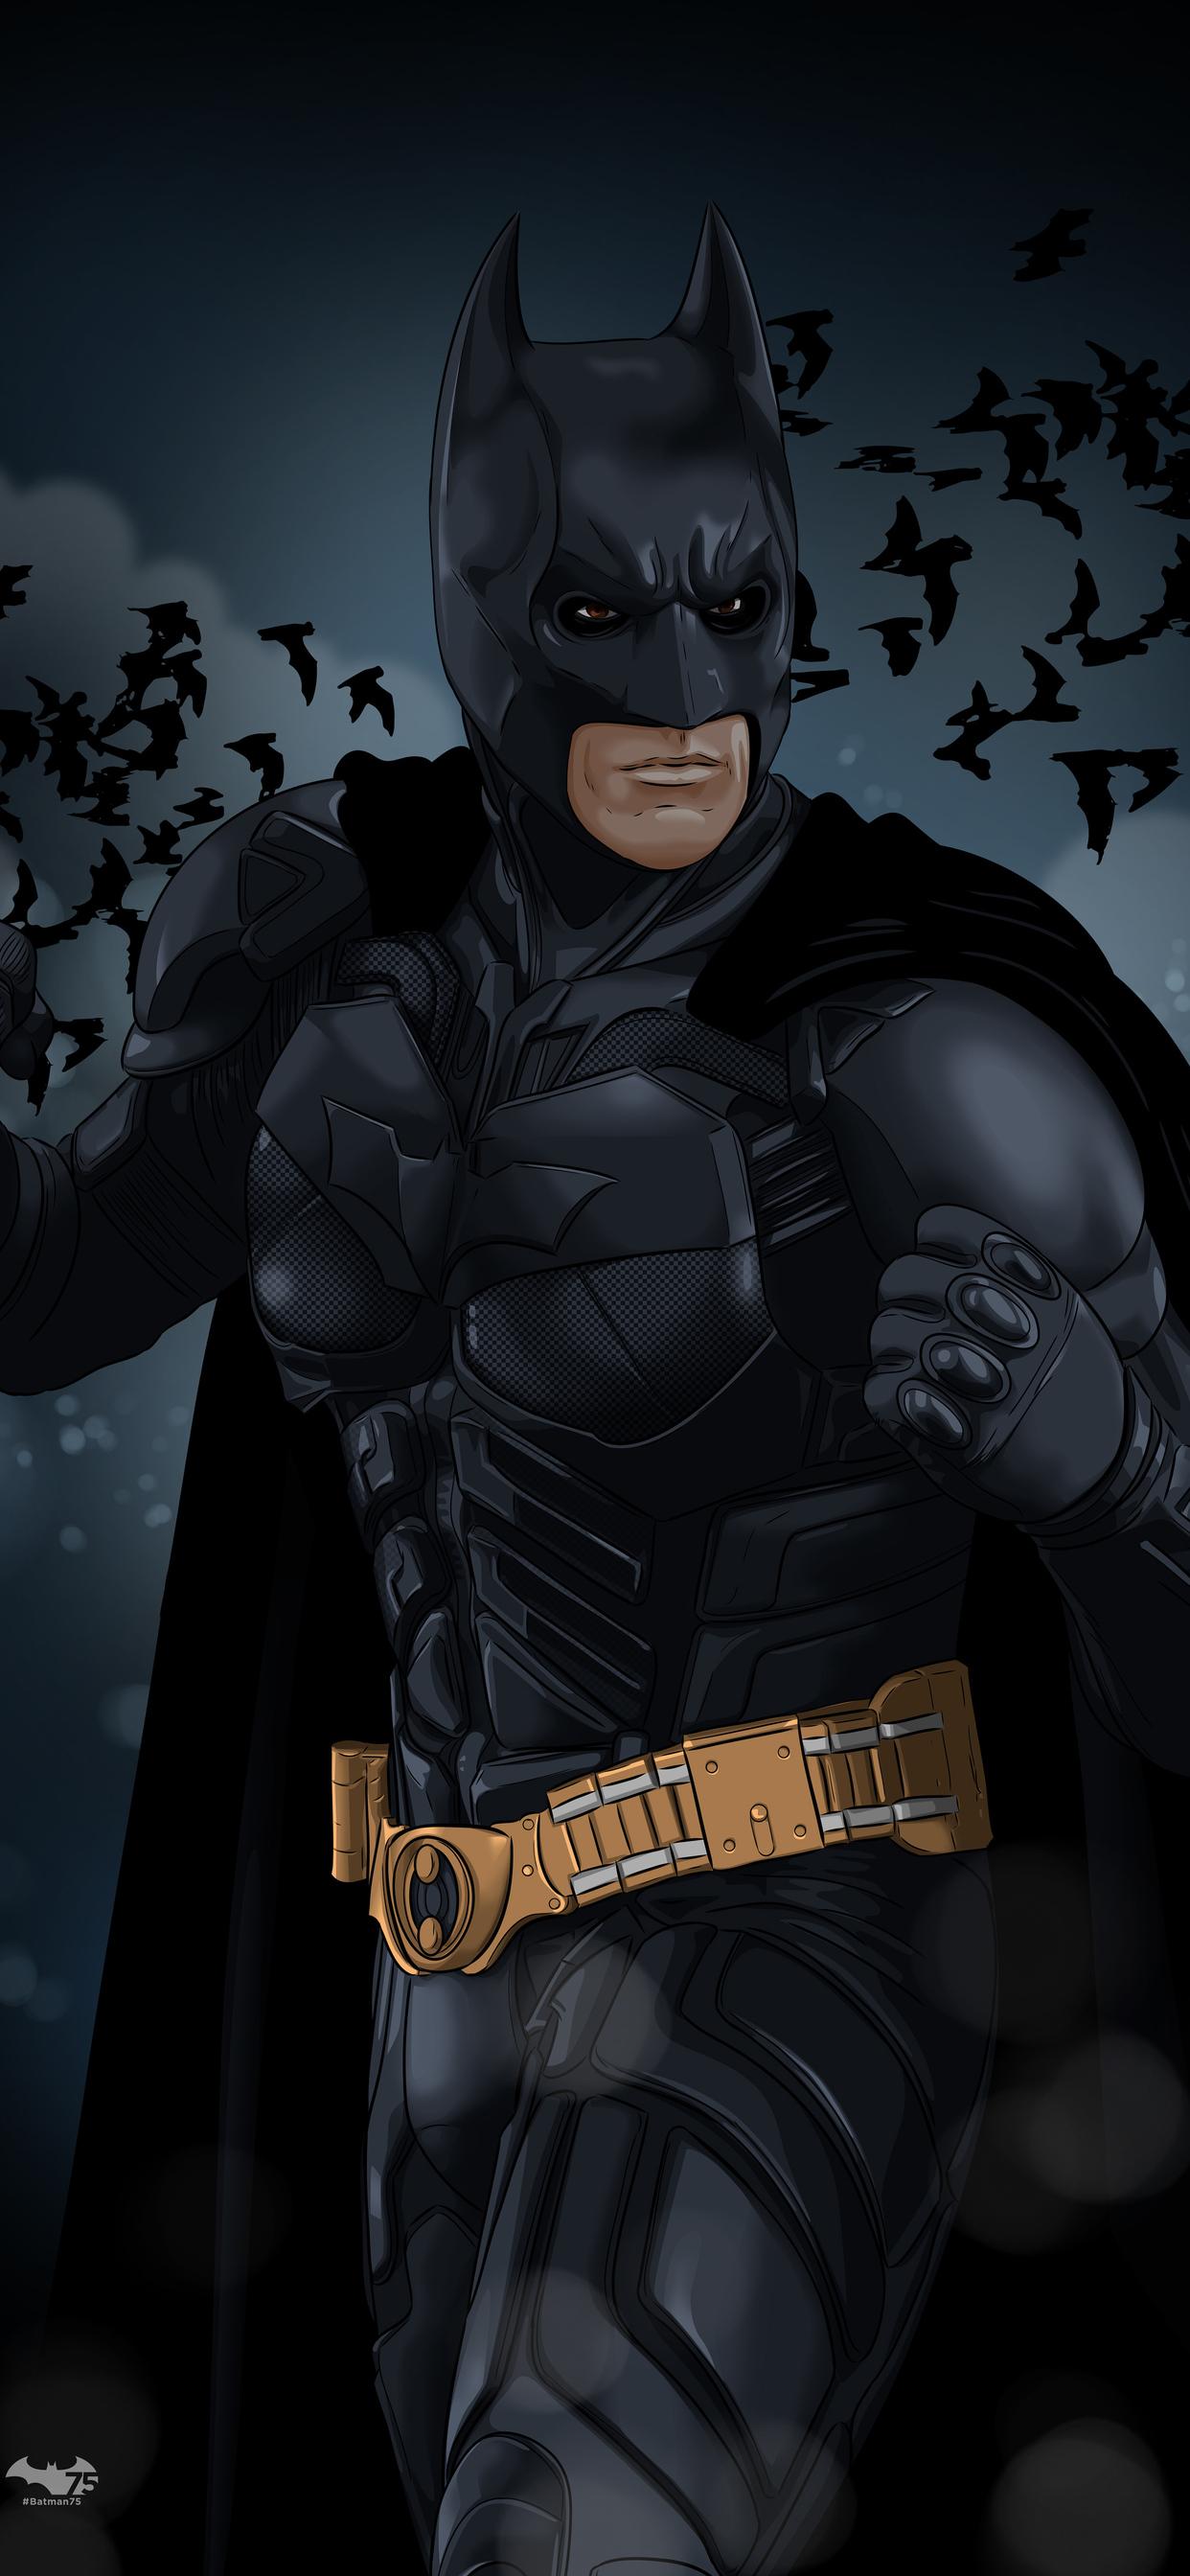 1242x2688 Christian Bale The Dark Knight Iphone Xs Max Hd 4k